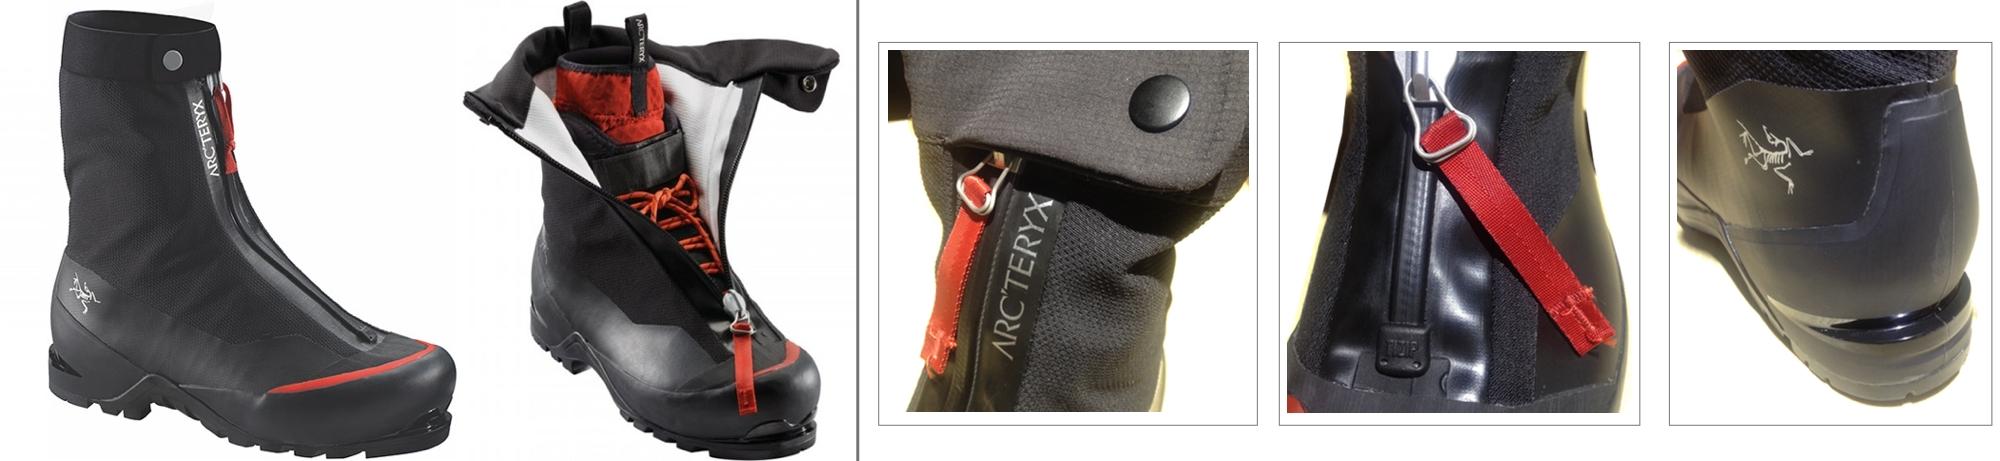 Arcteryx-Acrux-AR-2016-climbing-mountaineering-boot-details